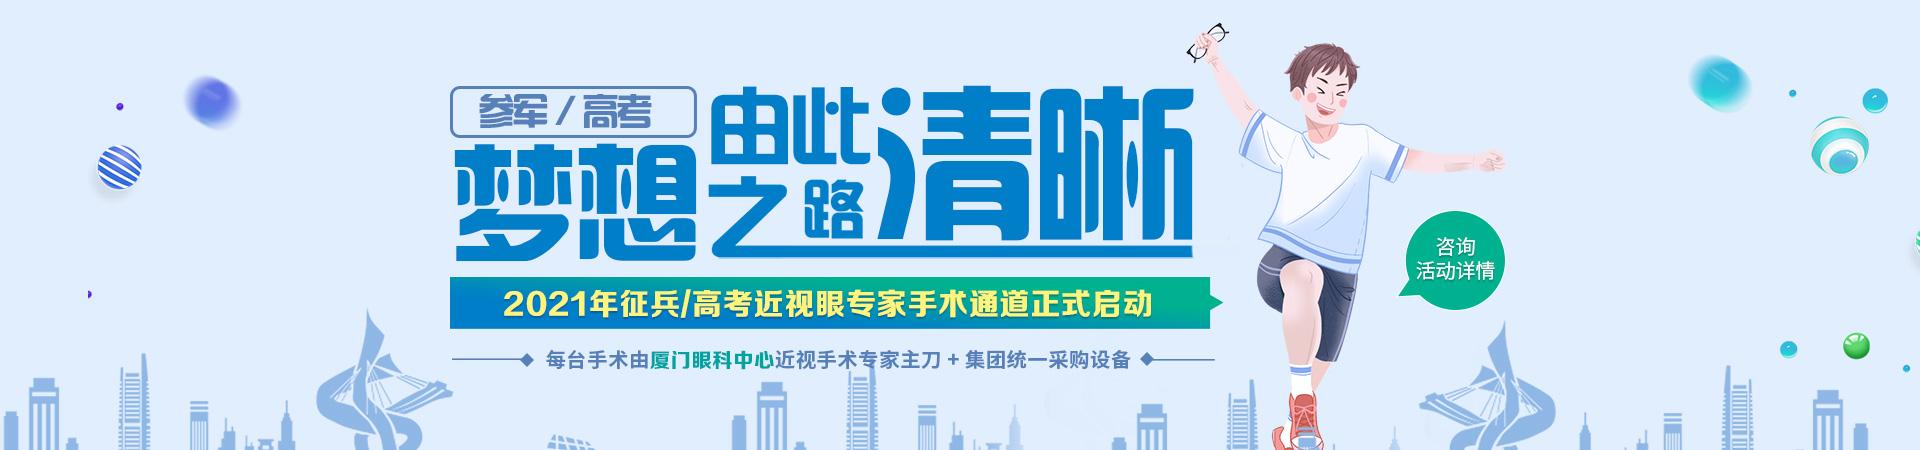 漳州高考参军活动banner